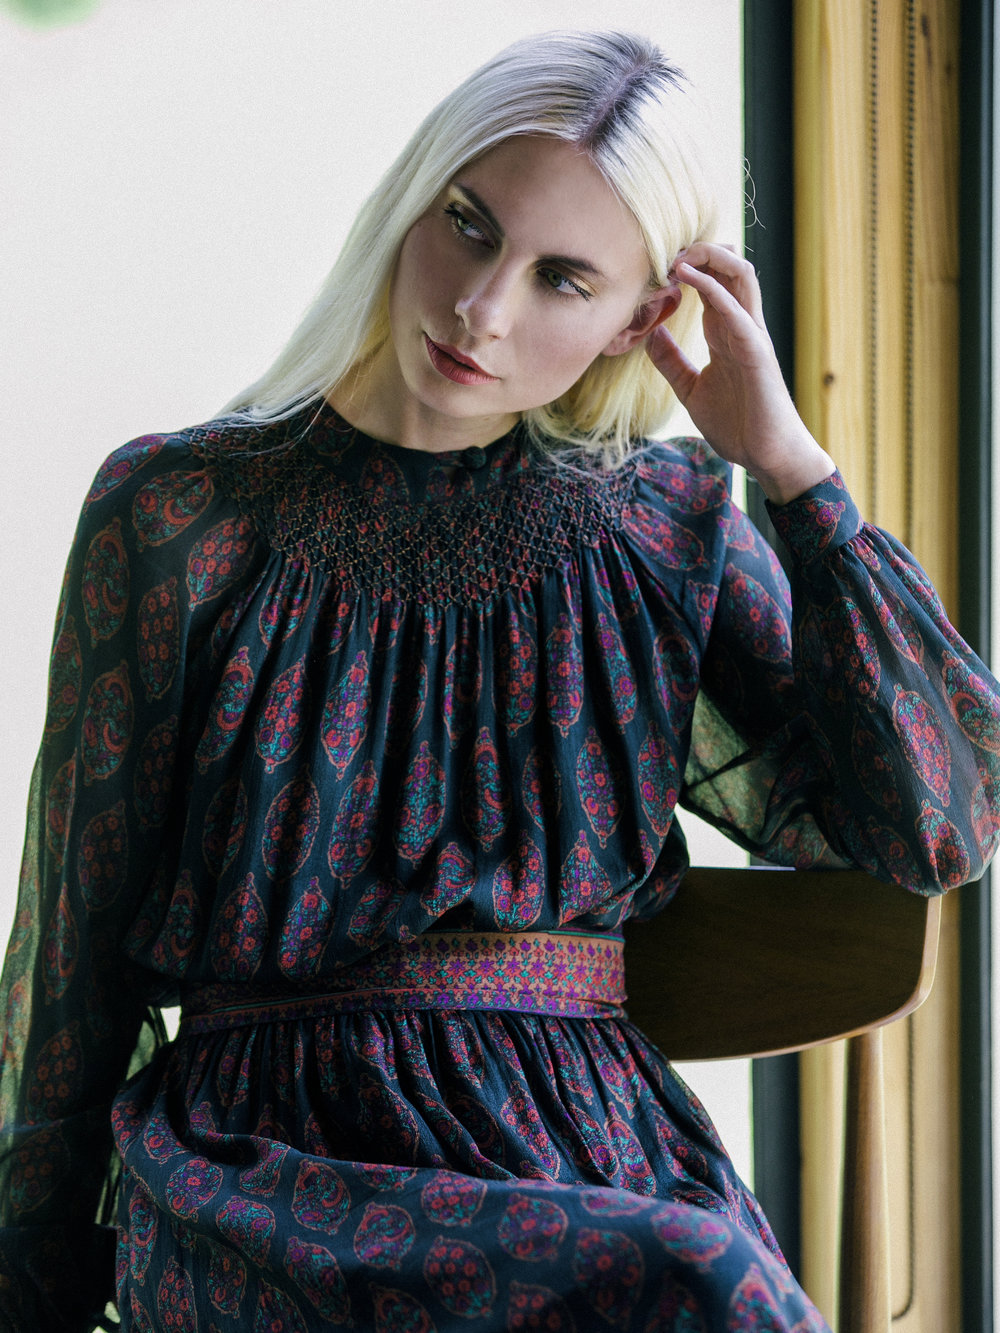 Garment_outfit3__9.jpg